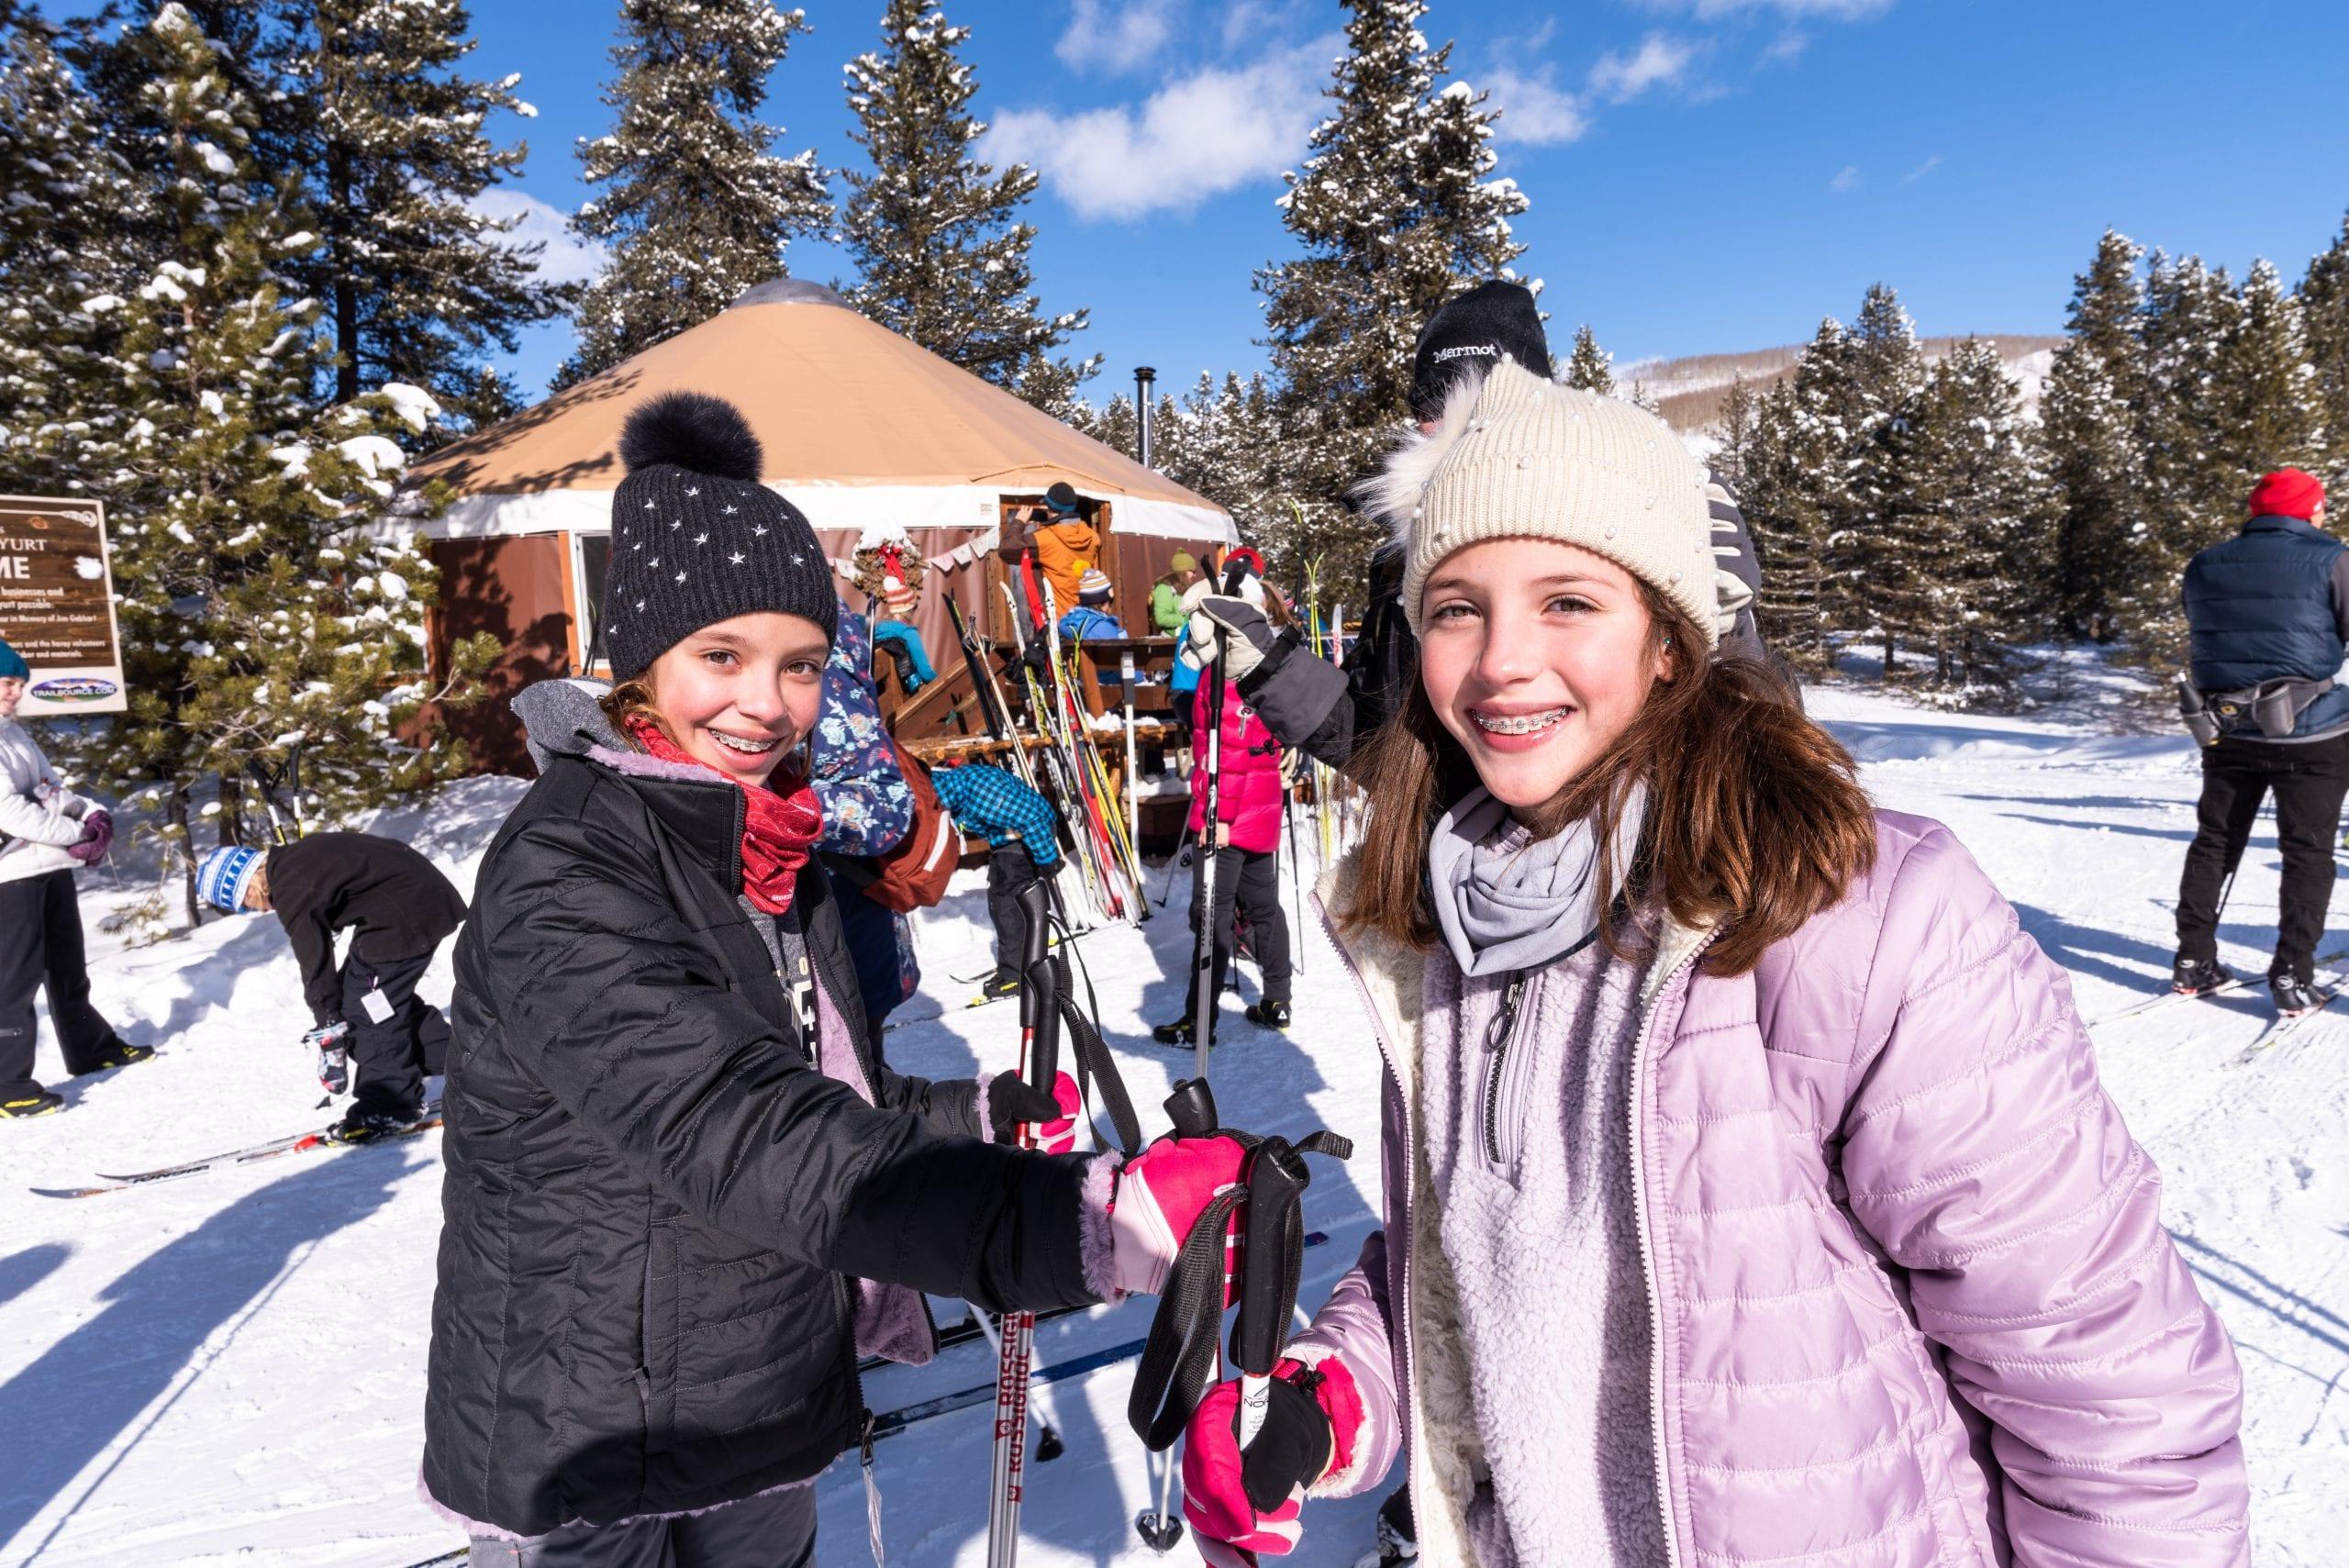 Young visitors enjoying the scene at Magic Meadows Yurt